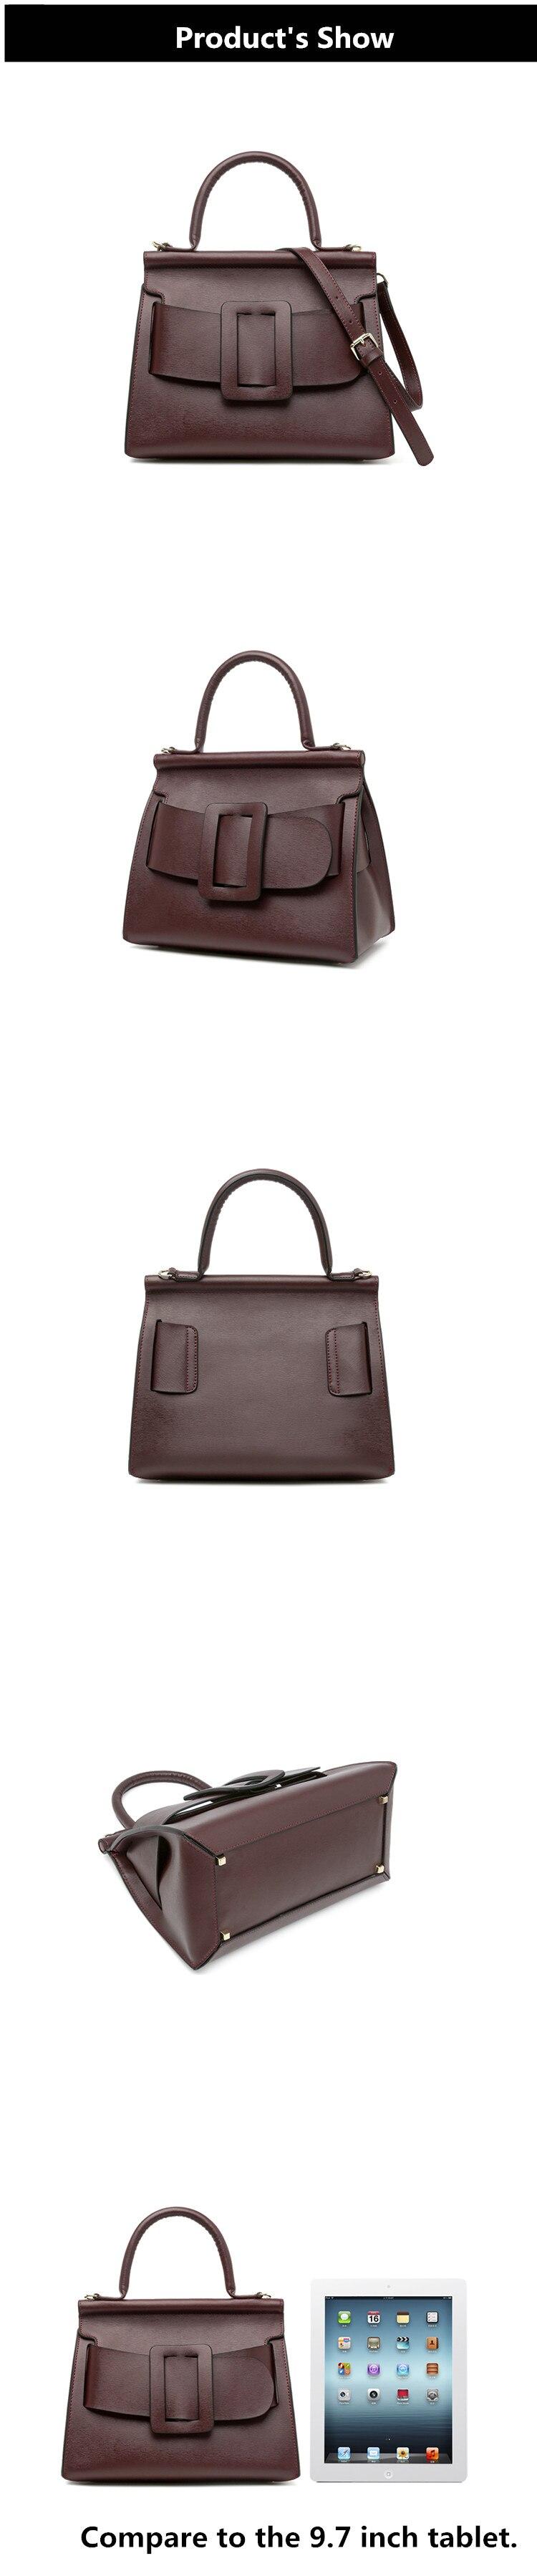 Famous Brand Designer Handbag Genuine Leather Women Vintage Bark Grain Big Buckle Handle bags with strap belt Boyy (4)_